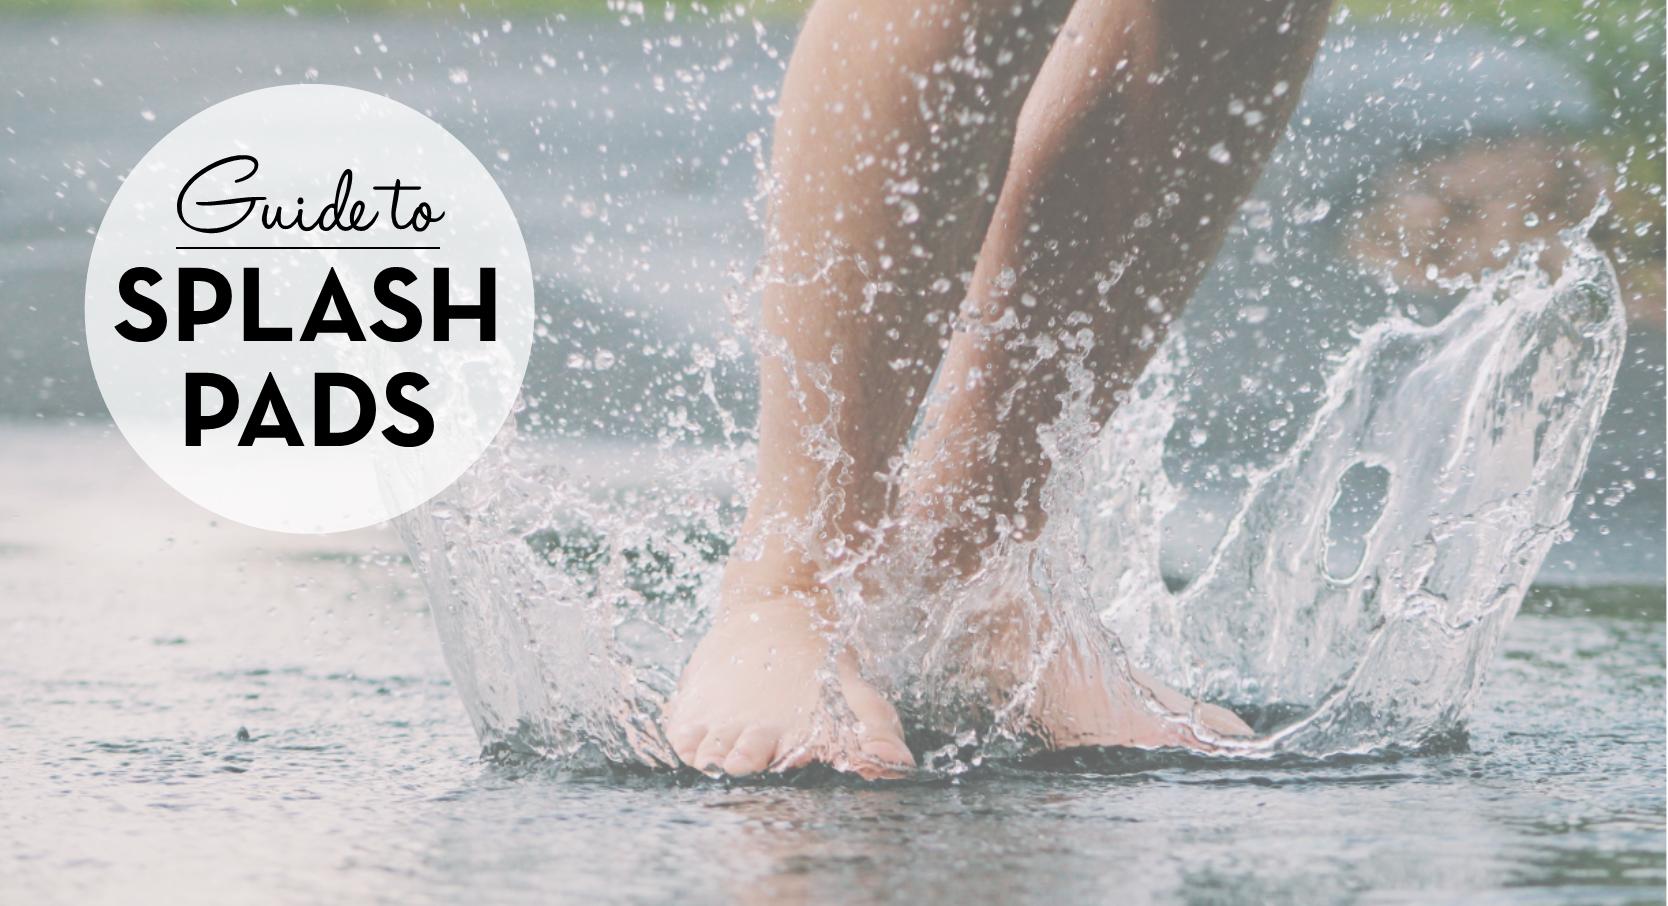 Knoxville Splash Pads